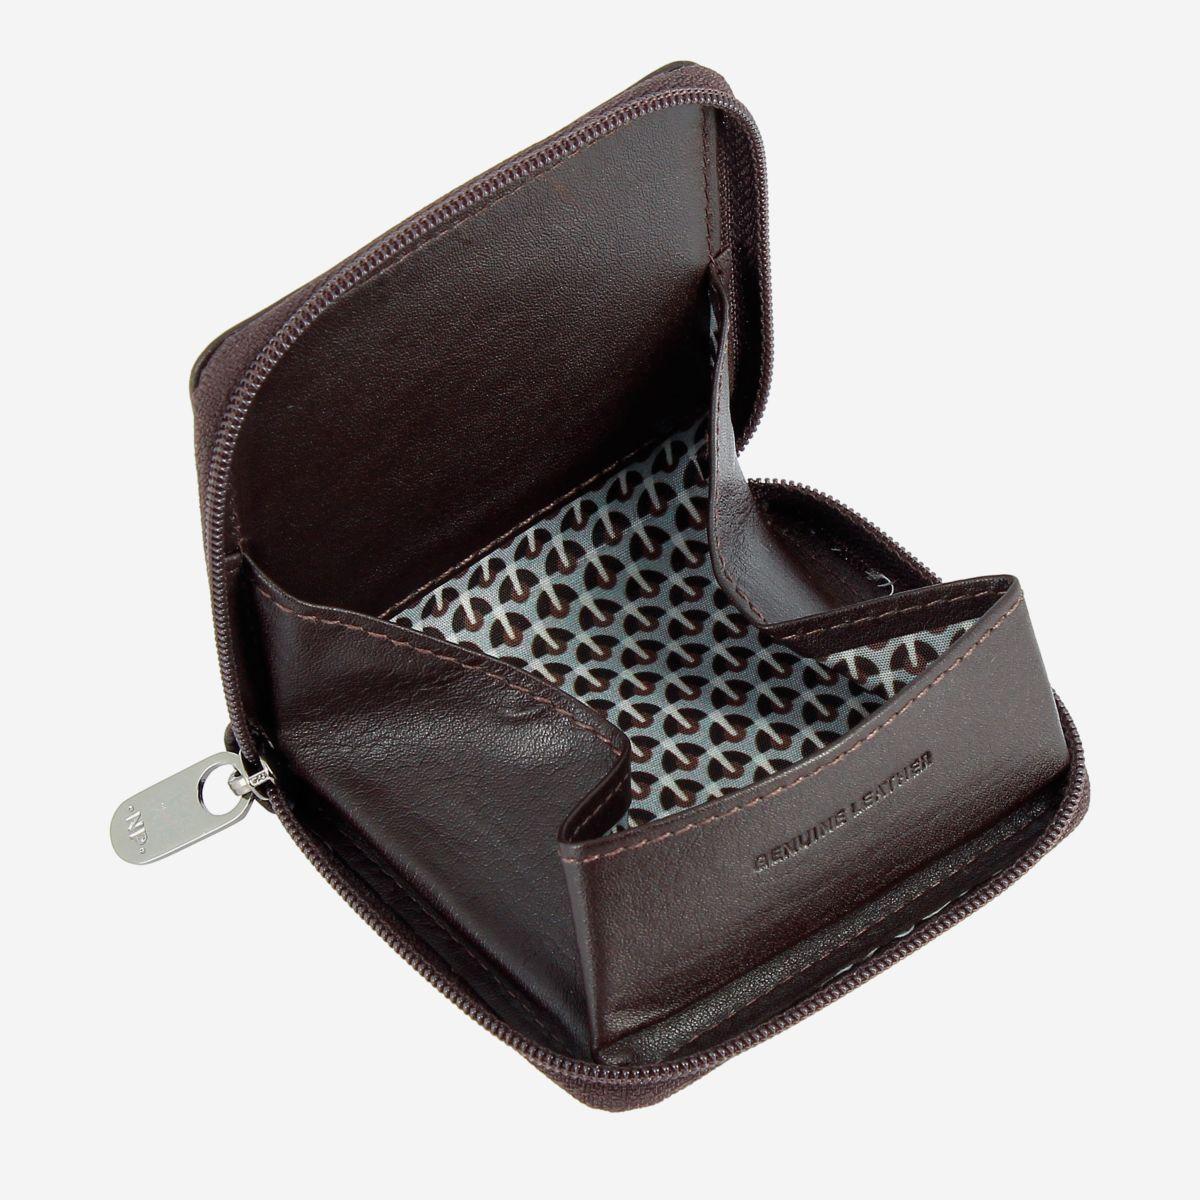 Leather Coin Purse - Dark Brown